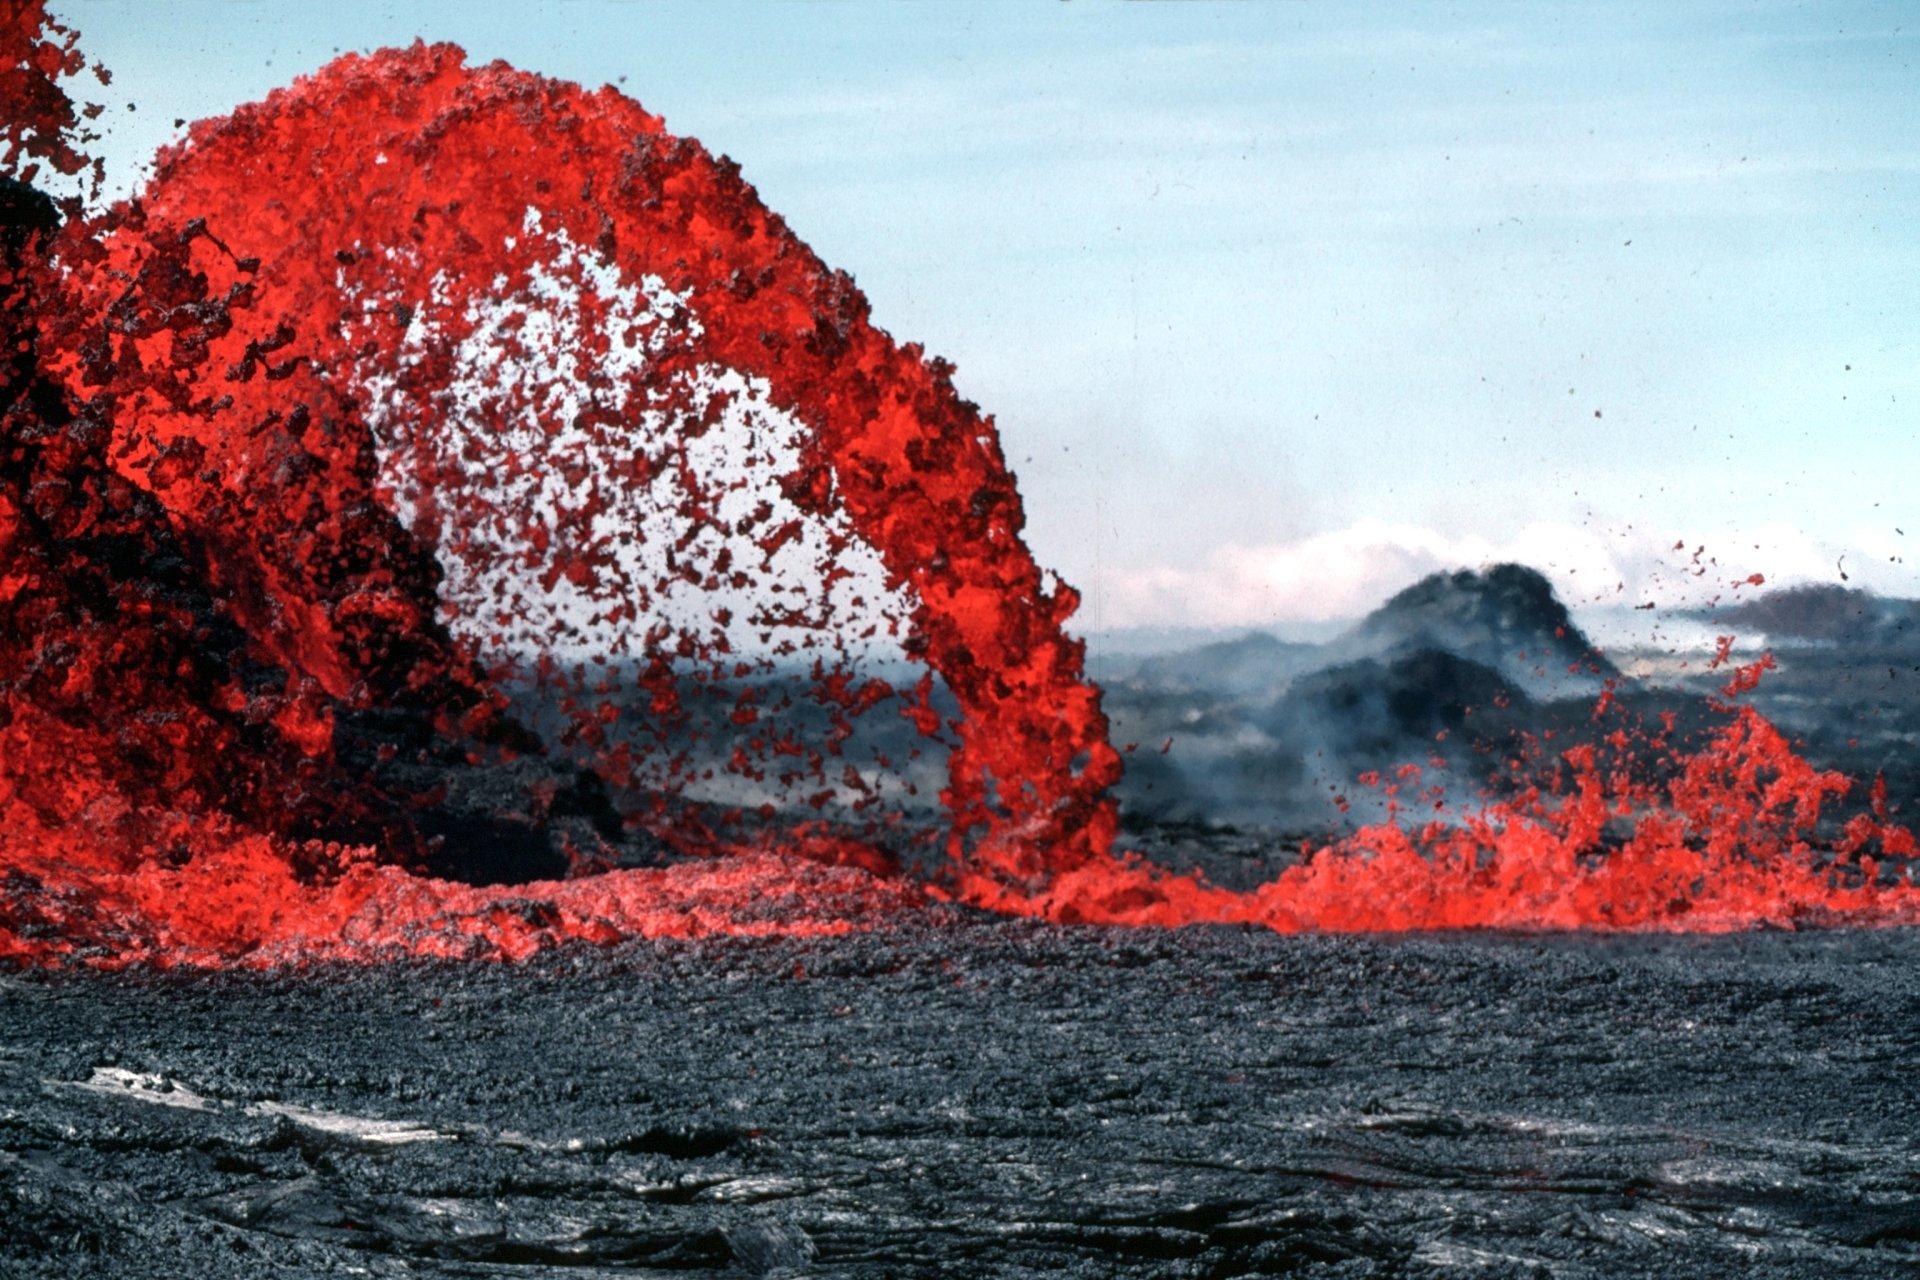 Jorden/Natur - Vulkan  Lava Bakgrund